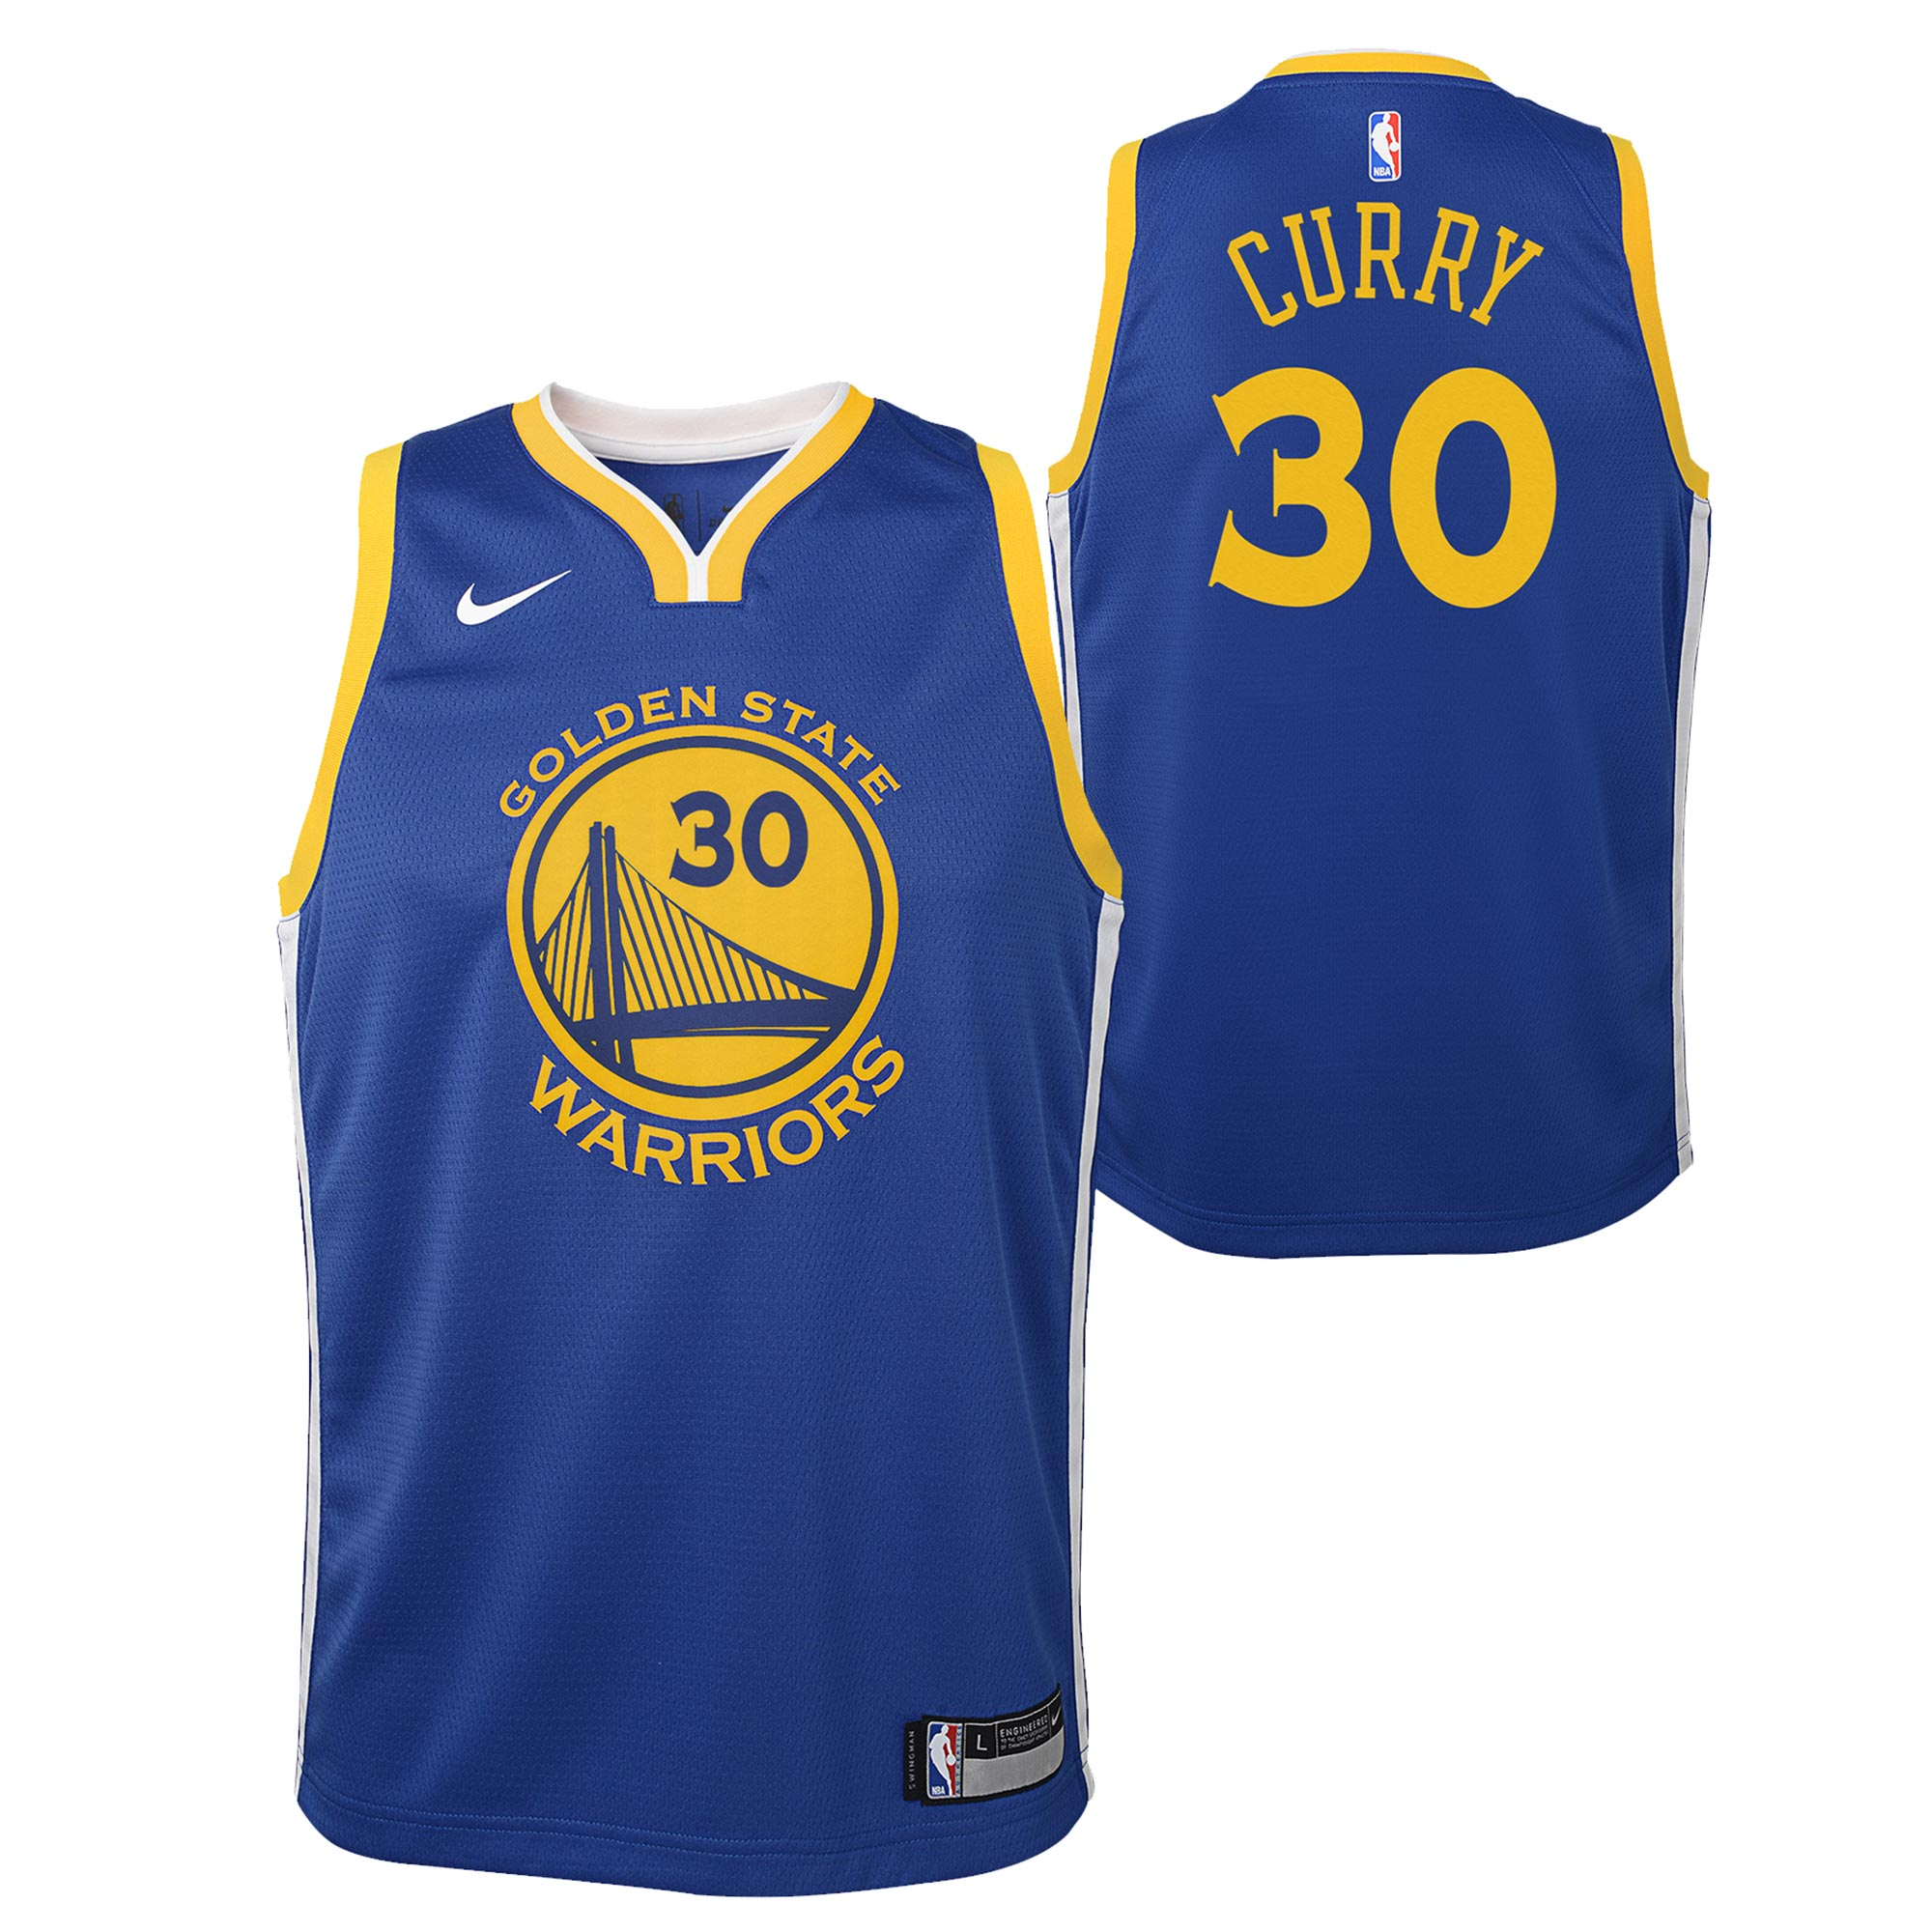 95594bdd7f4d8 Basketbalové kluby (všetky) | Nike Golden State Warriors Stephen ...